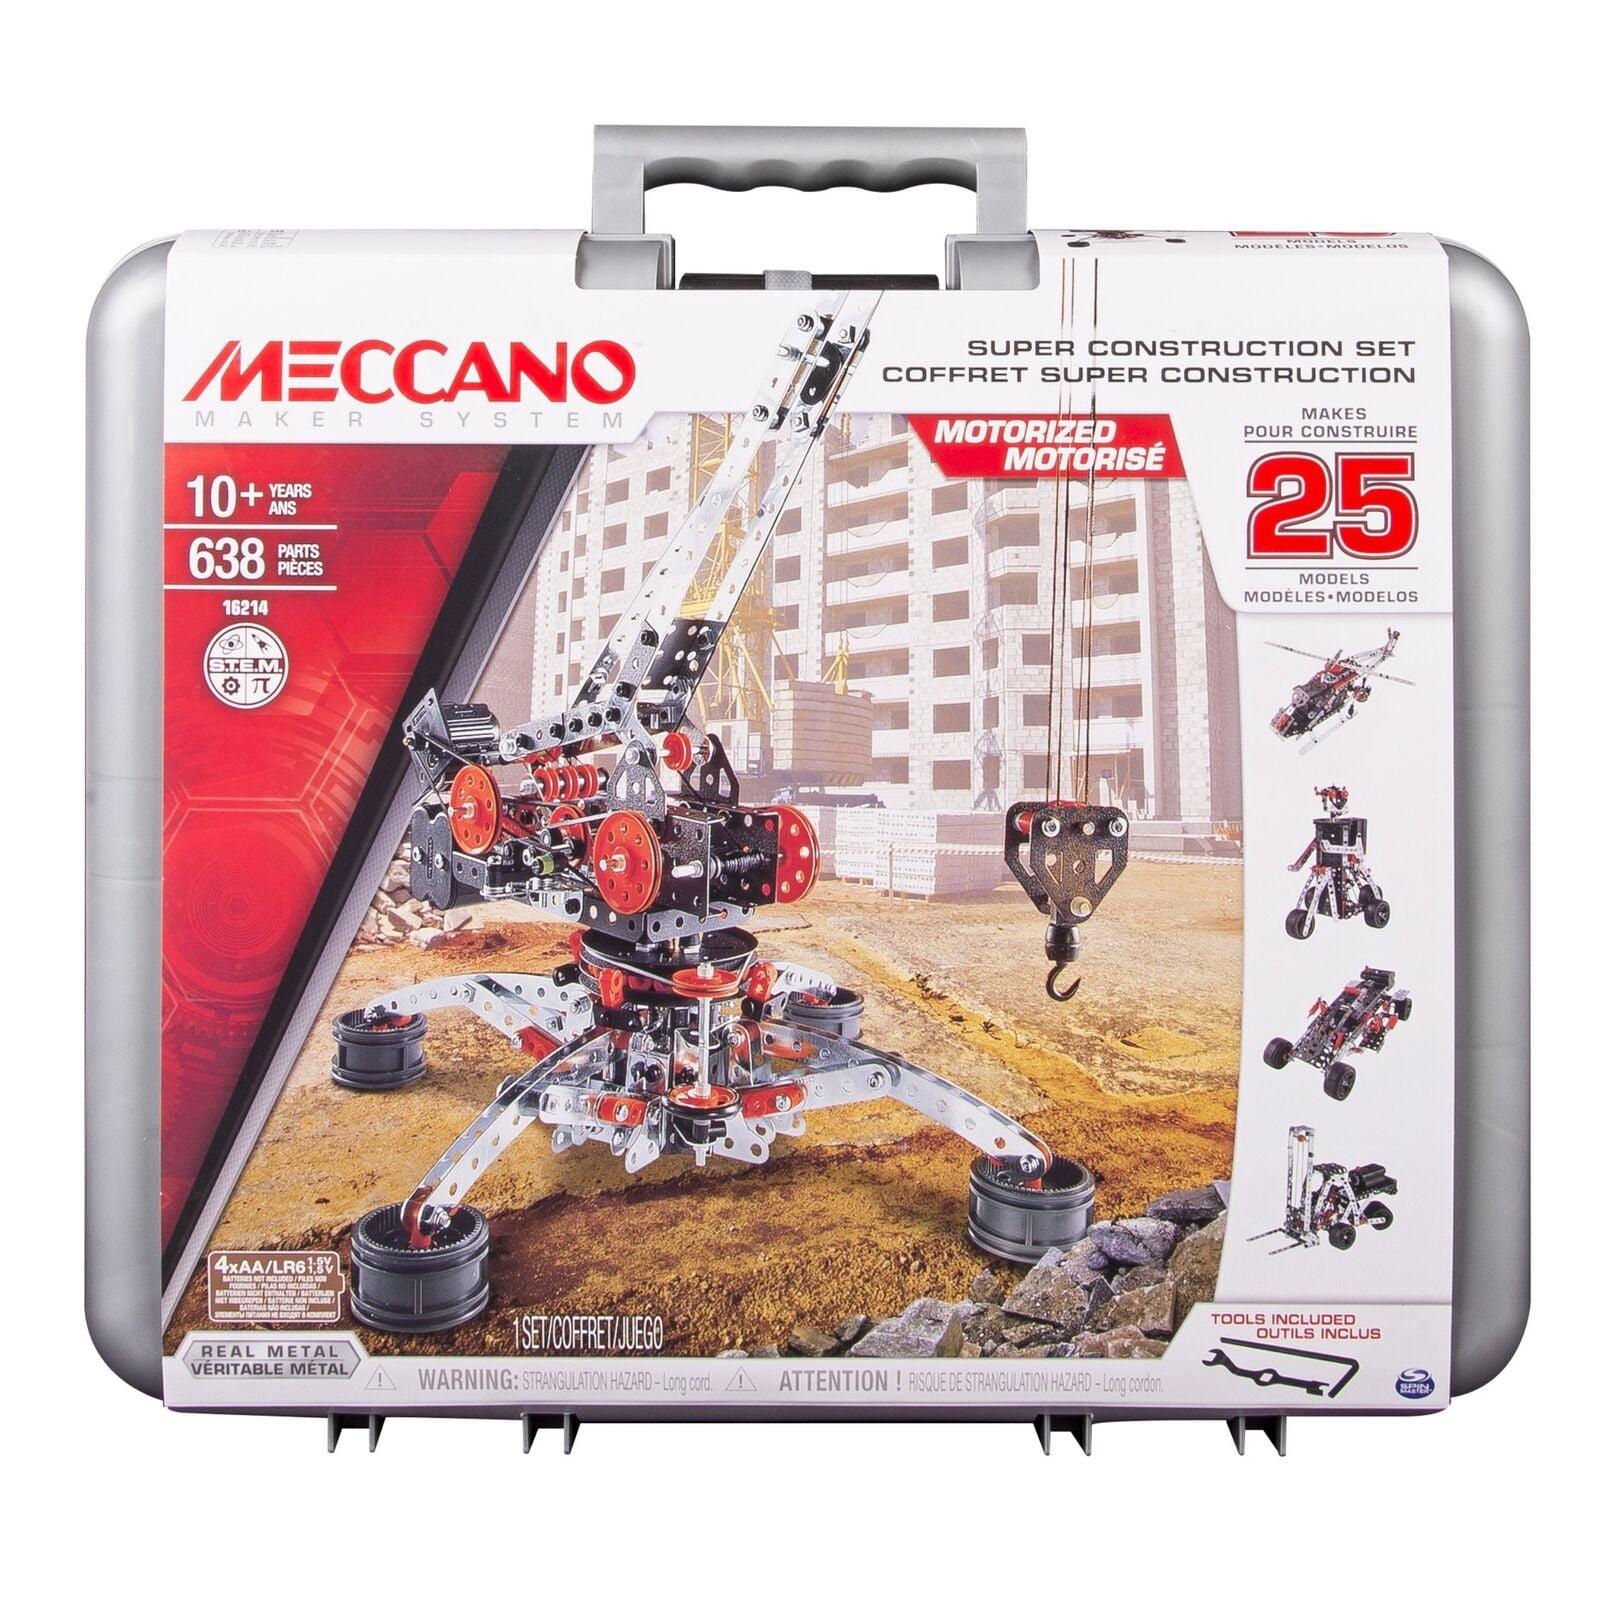 Meccano Erector Super Construction 25-in-1 Building Set, 638 Parts, for Ages ...